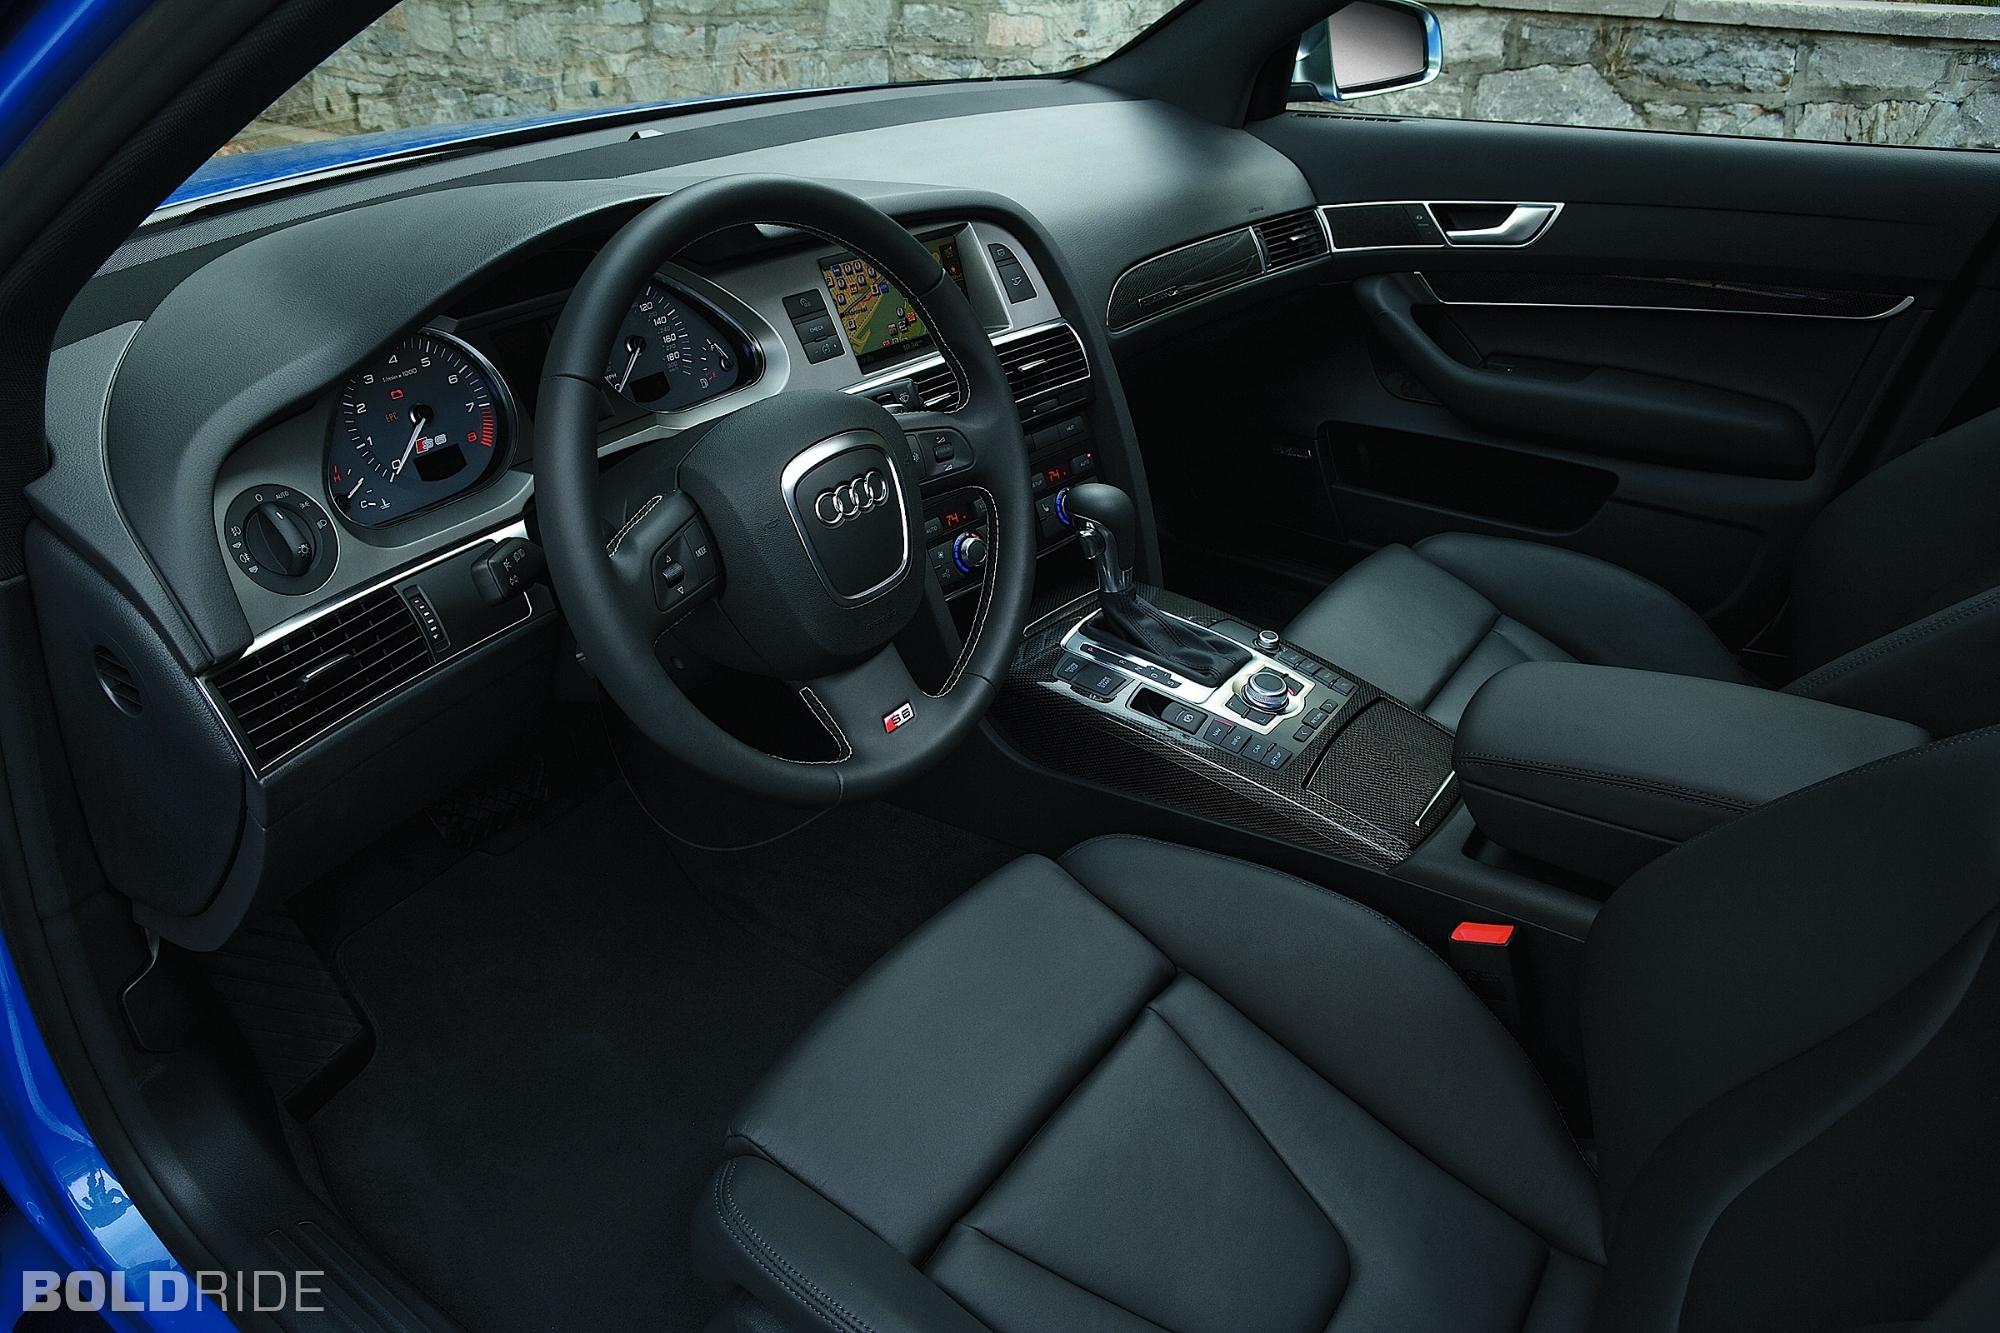 2008 Audi S6 Image 13